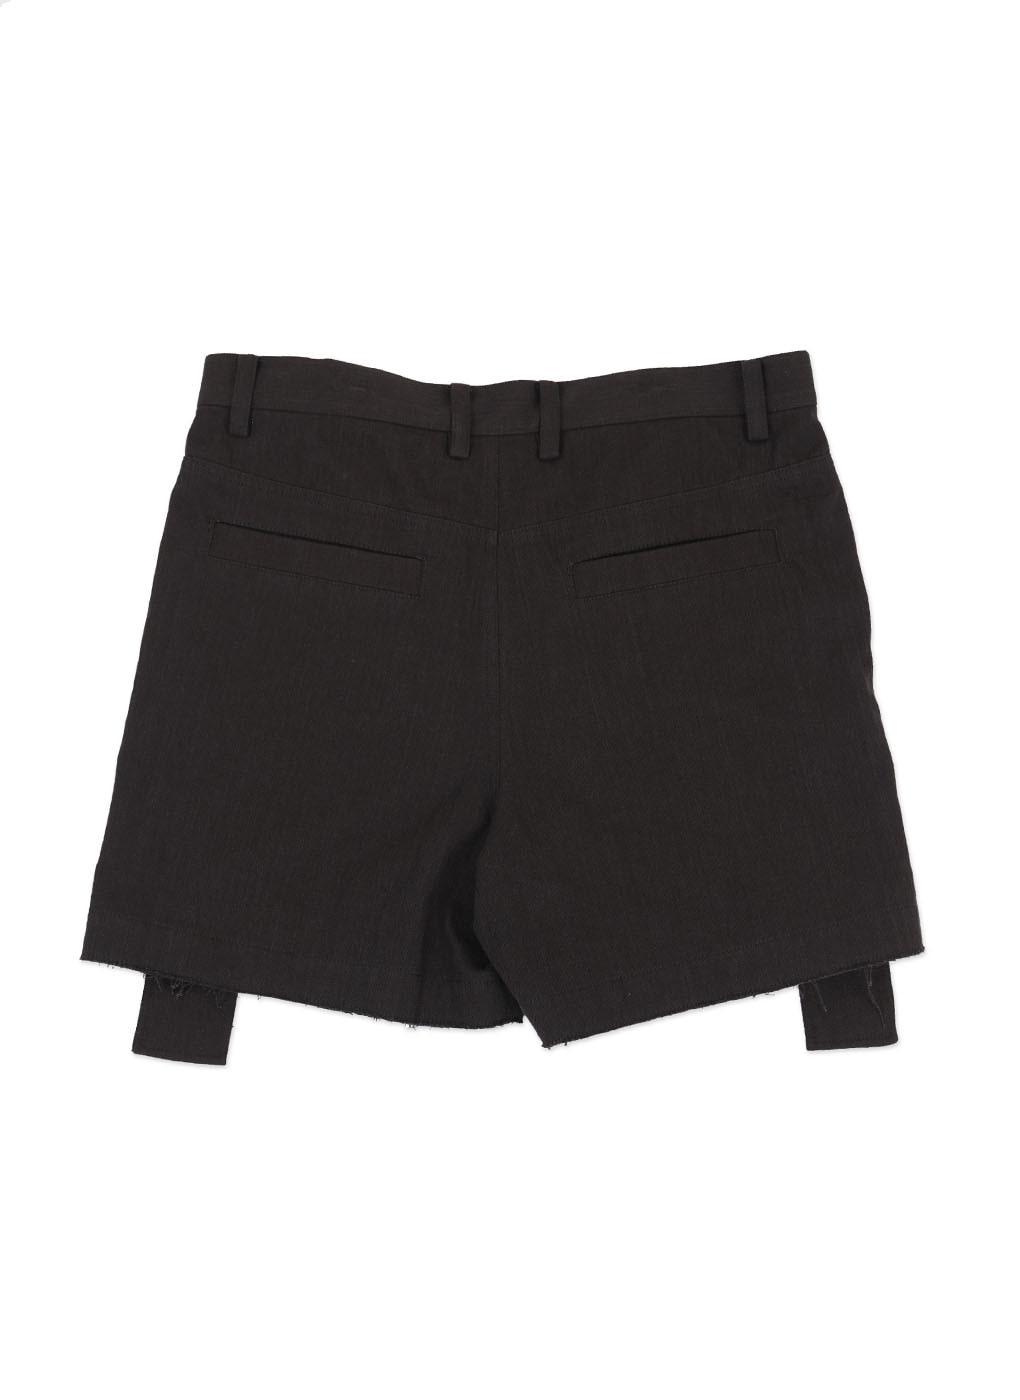 Black Denim Zipper Shorts